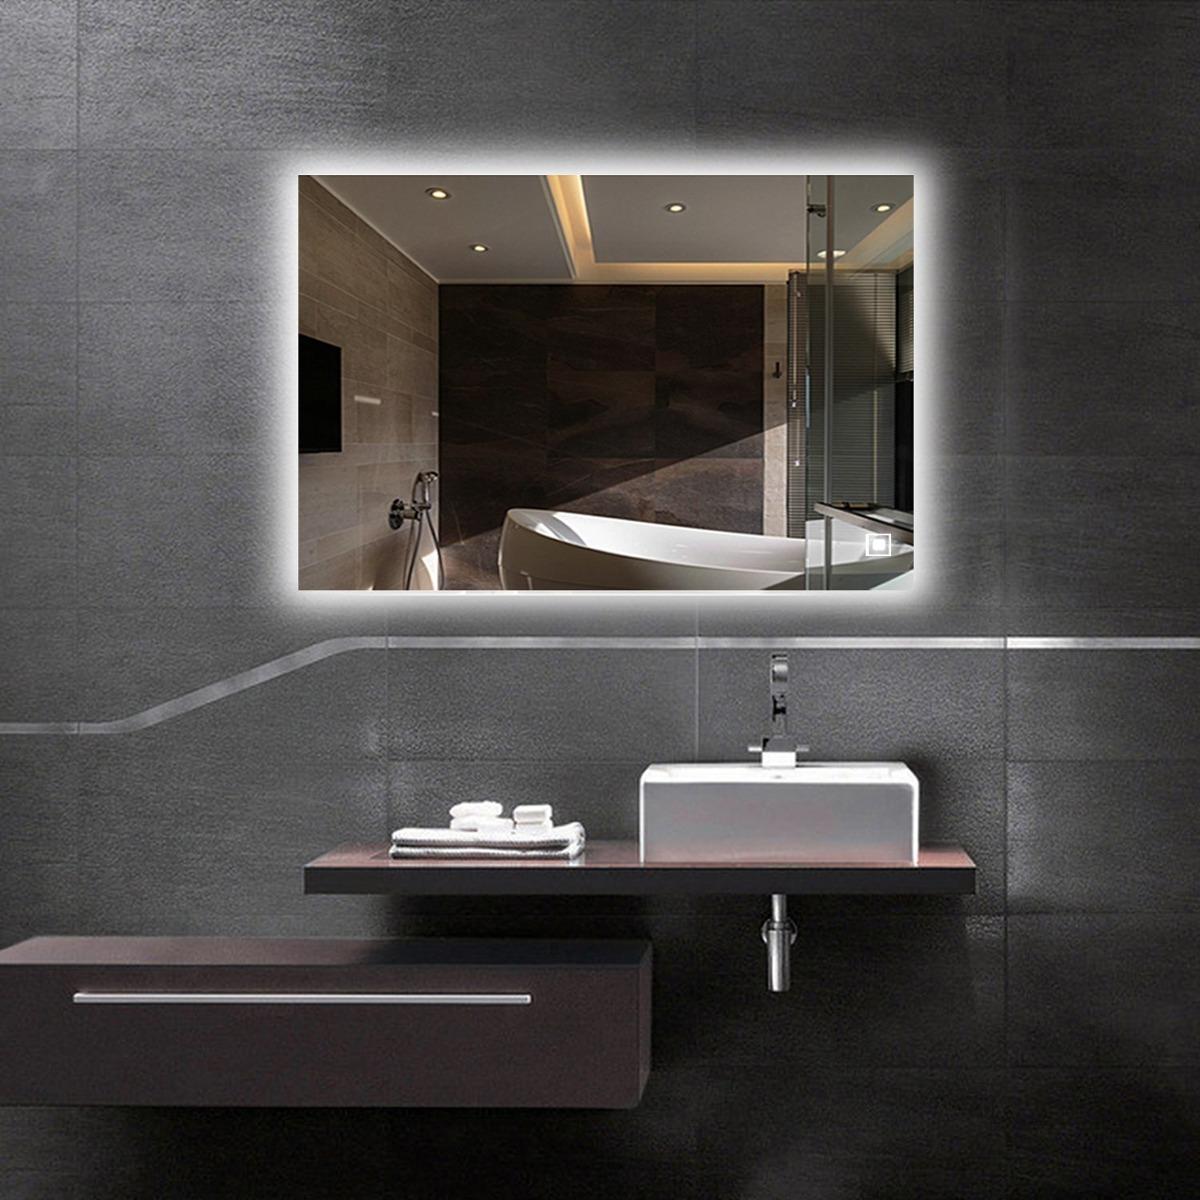 Espejo retroiluminado led ba o iluminado con espejo regula 7 en mercado libre - Espejo retroiluminado bano ...